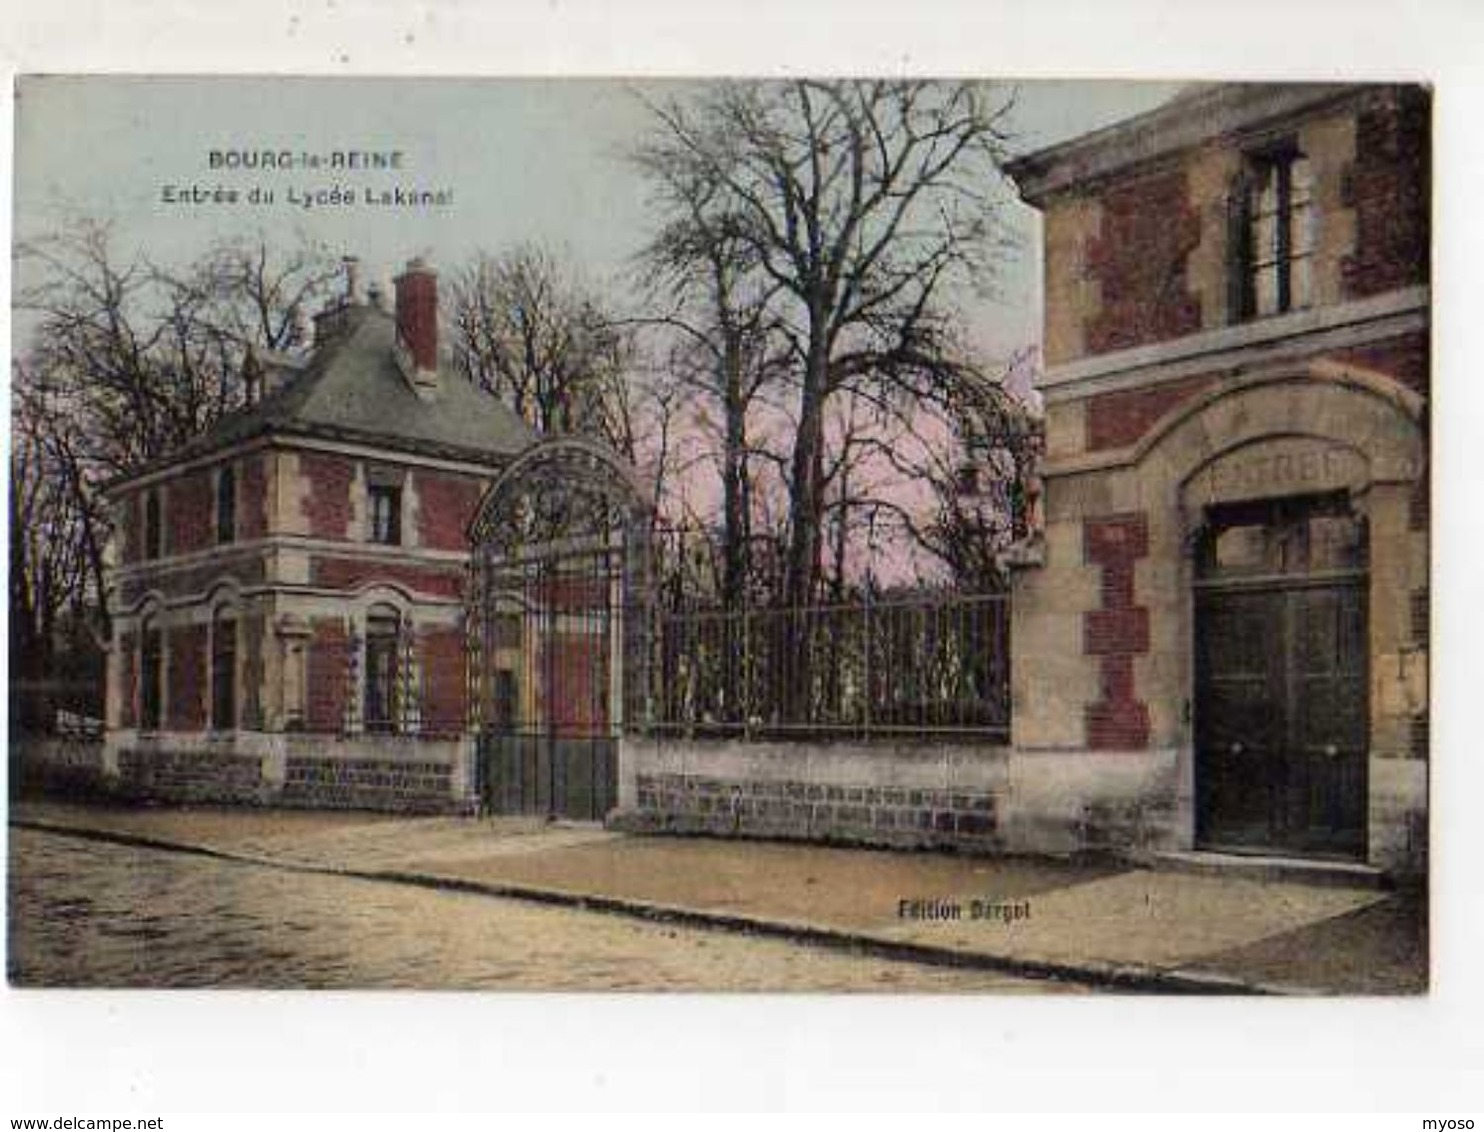 92 BOURG LA REINE Entree Du Lycee Lakanal - Bourg La Reine